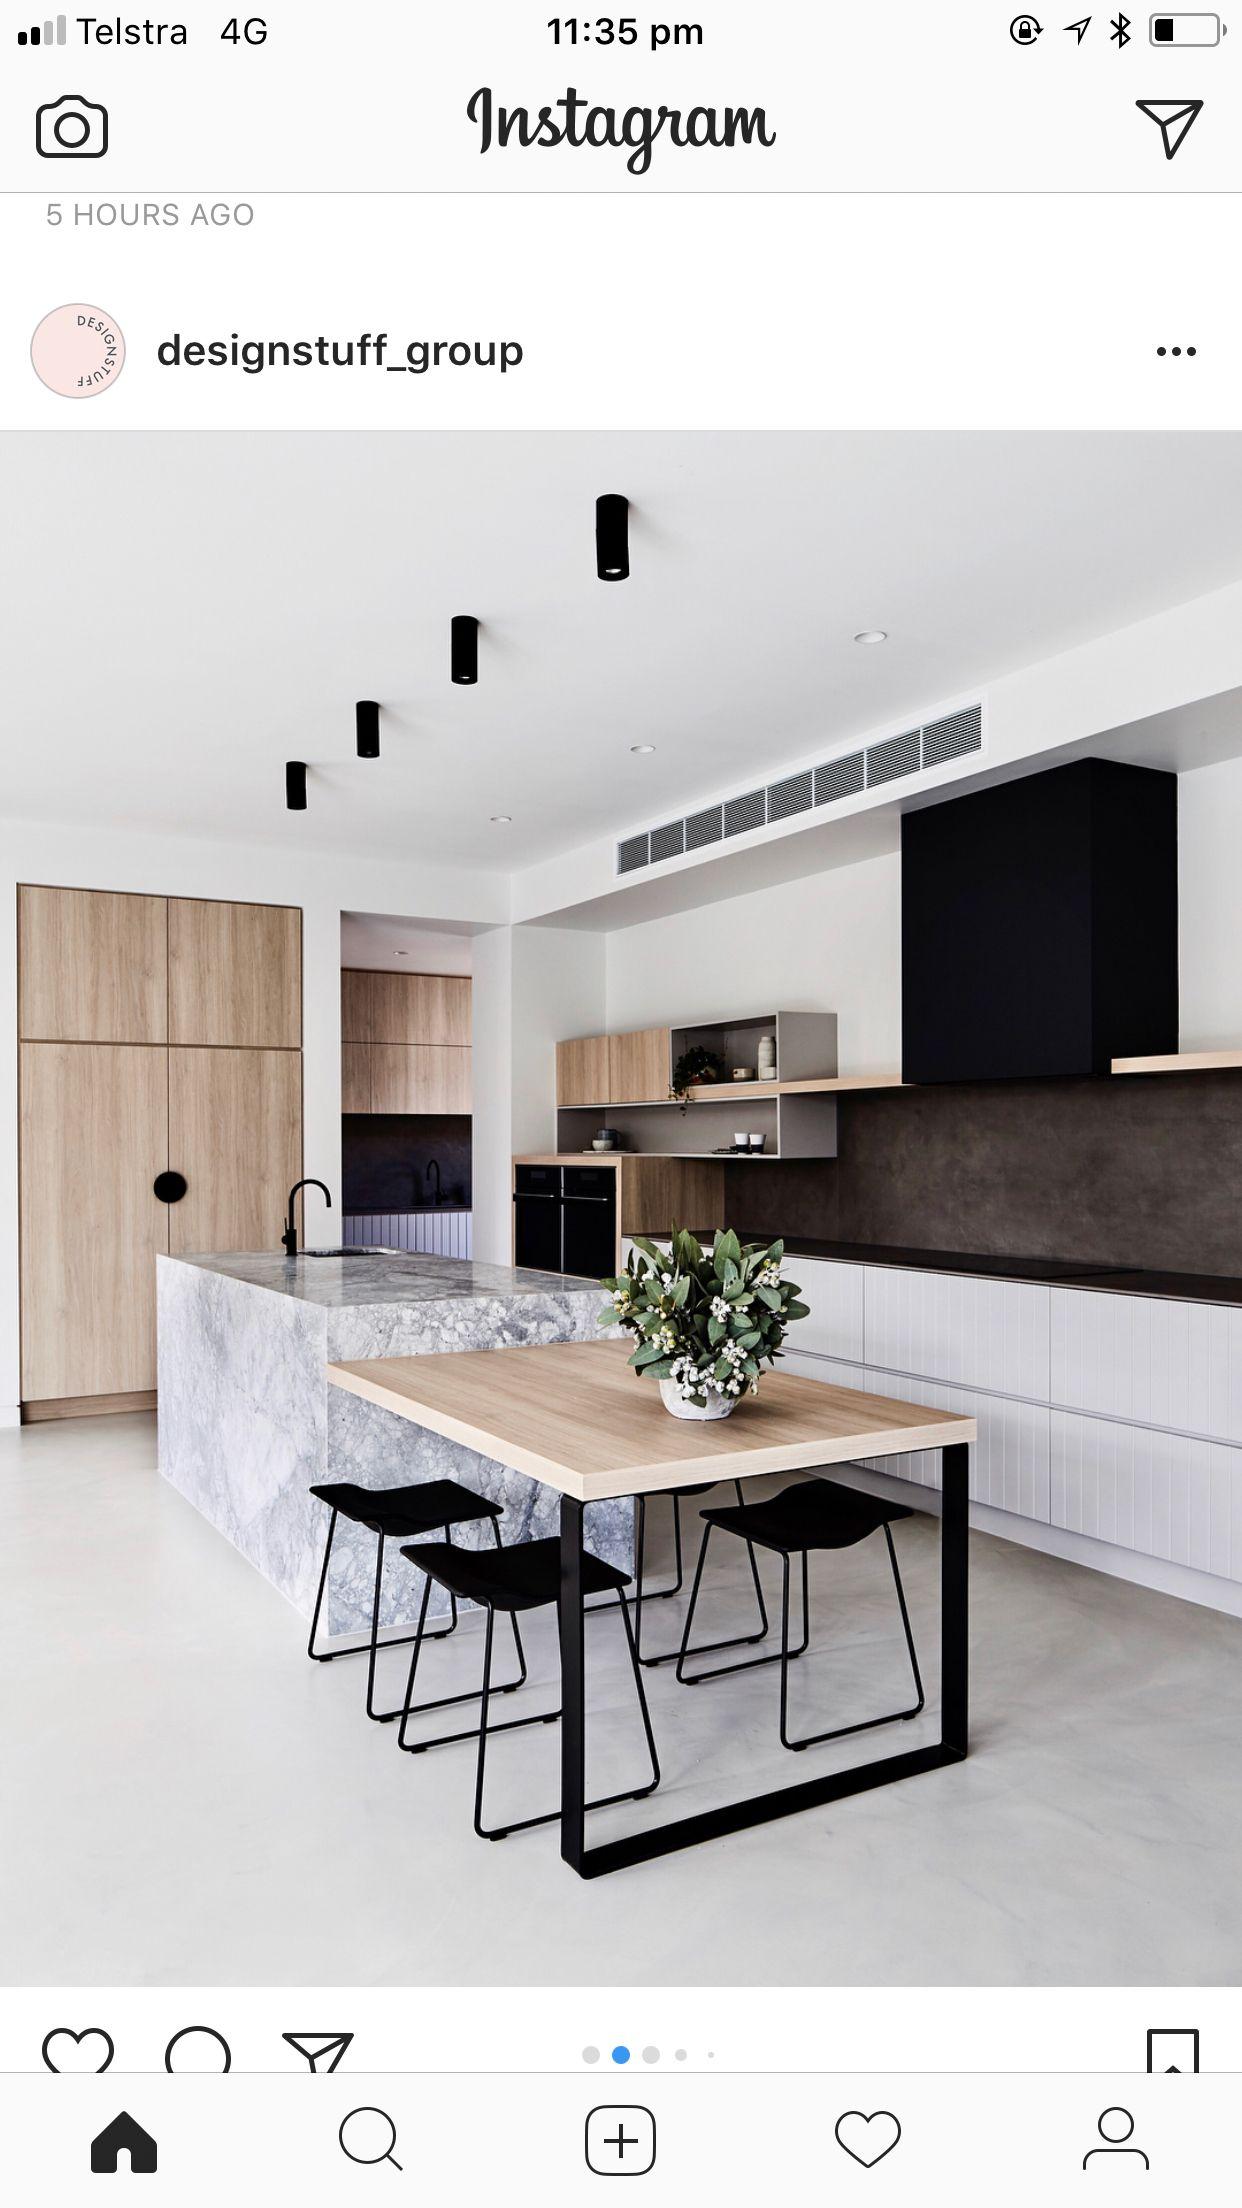 Pin de Colombe MARCIANO en Cuisine dans la maison | Pinterest ...